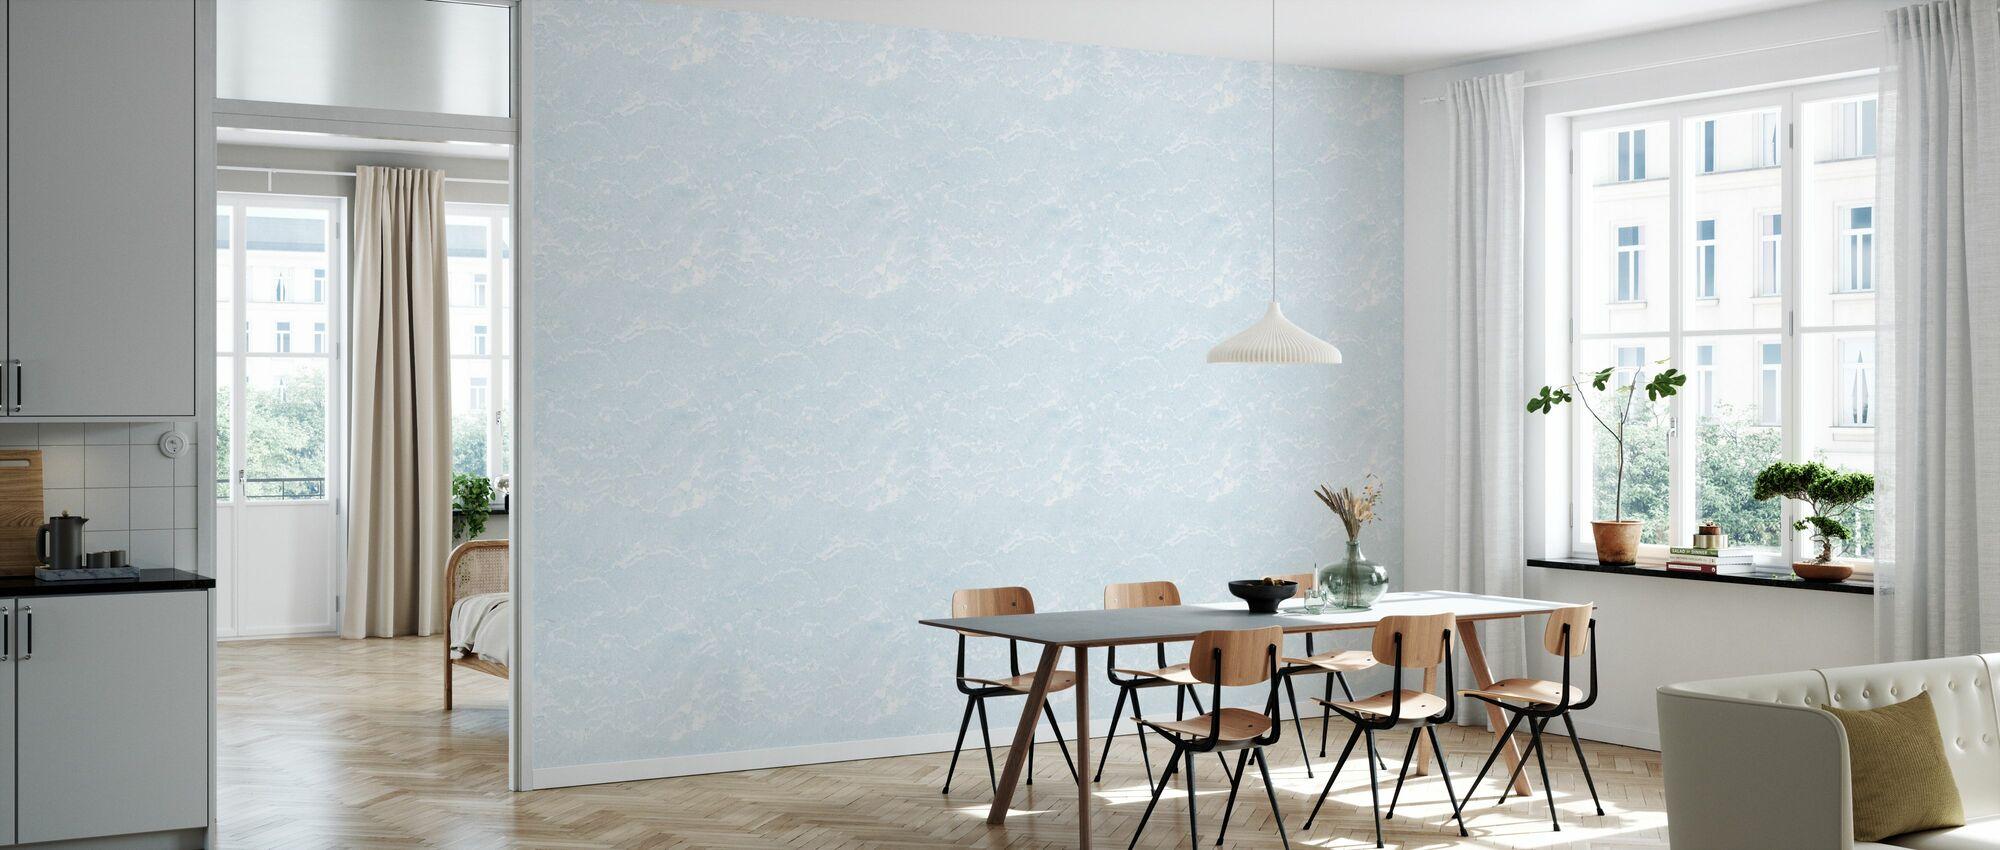 Seamless Azure Marble - Wallpaper - Kitchen